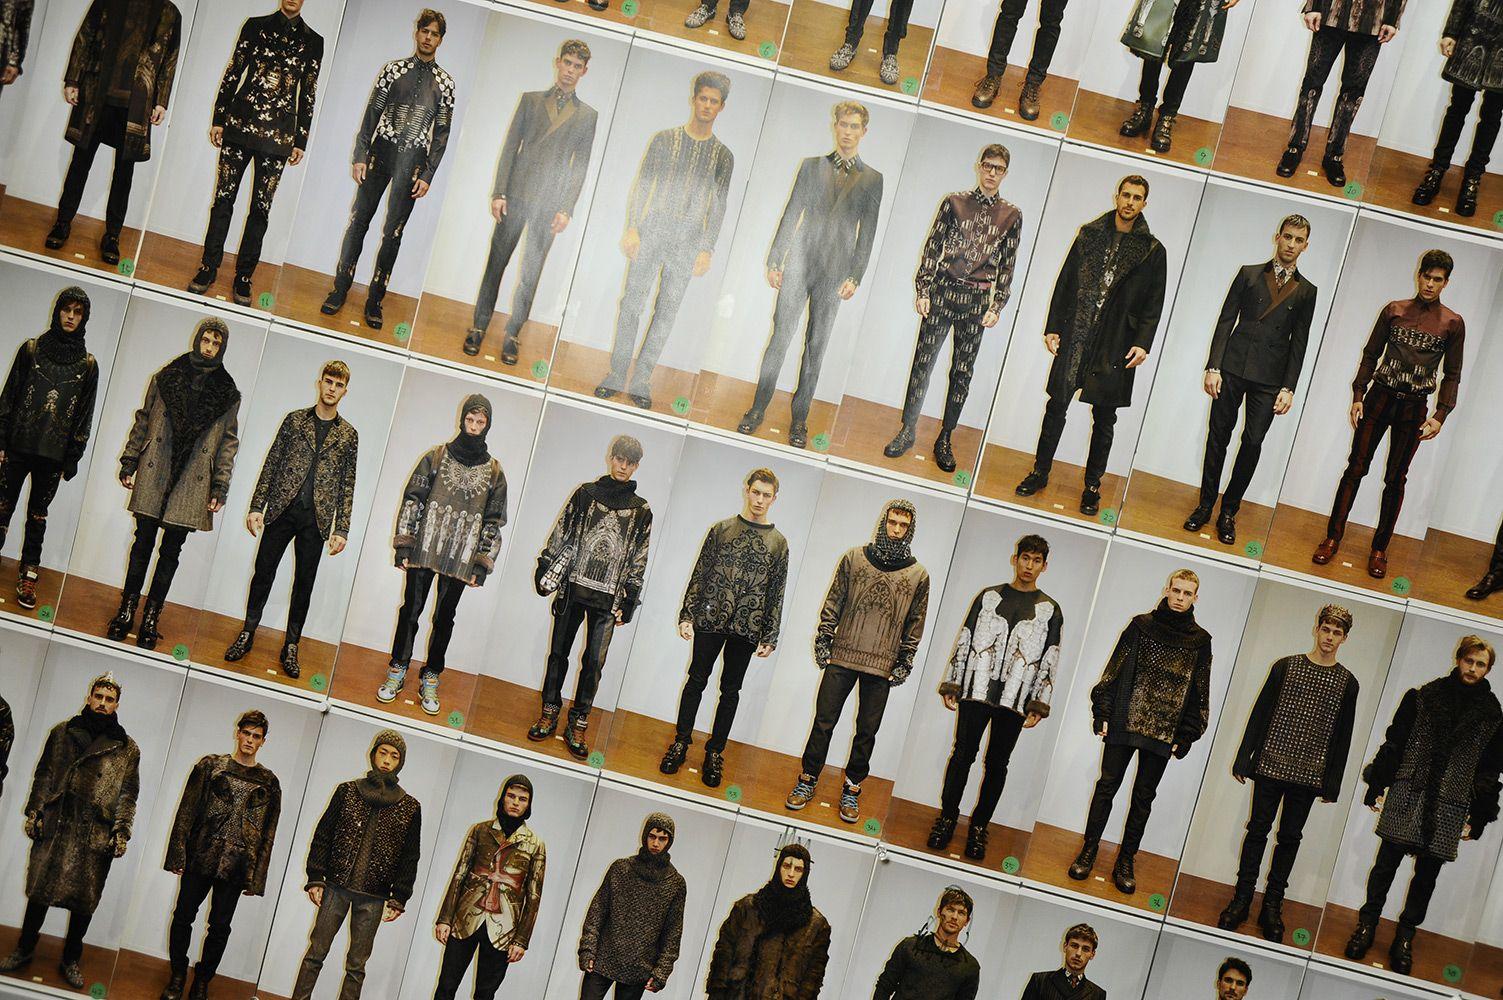 Dolce & Gabbana Man Runway Backstage Photo Gallery – Fall Winter 2014 2015